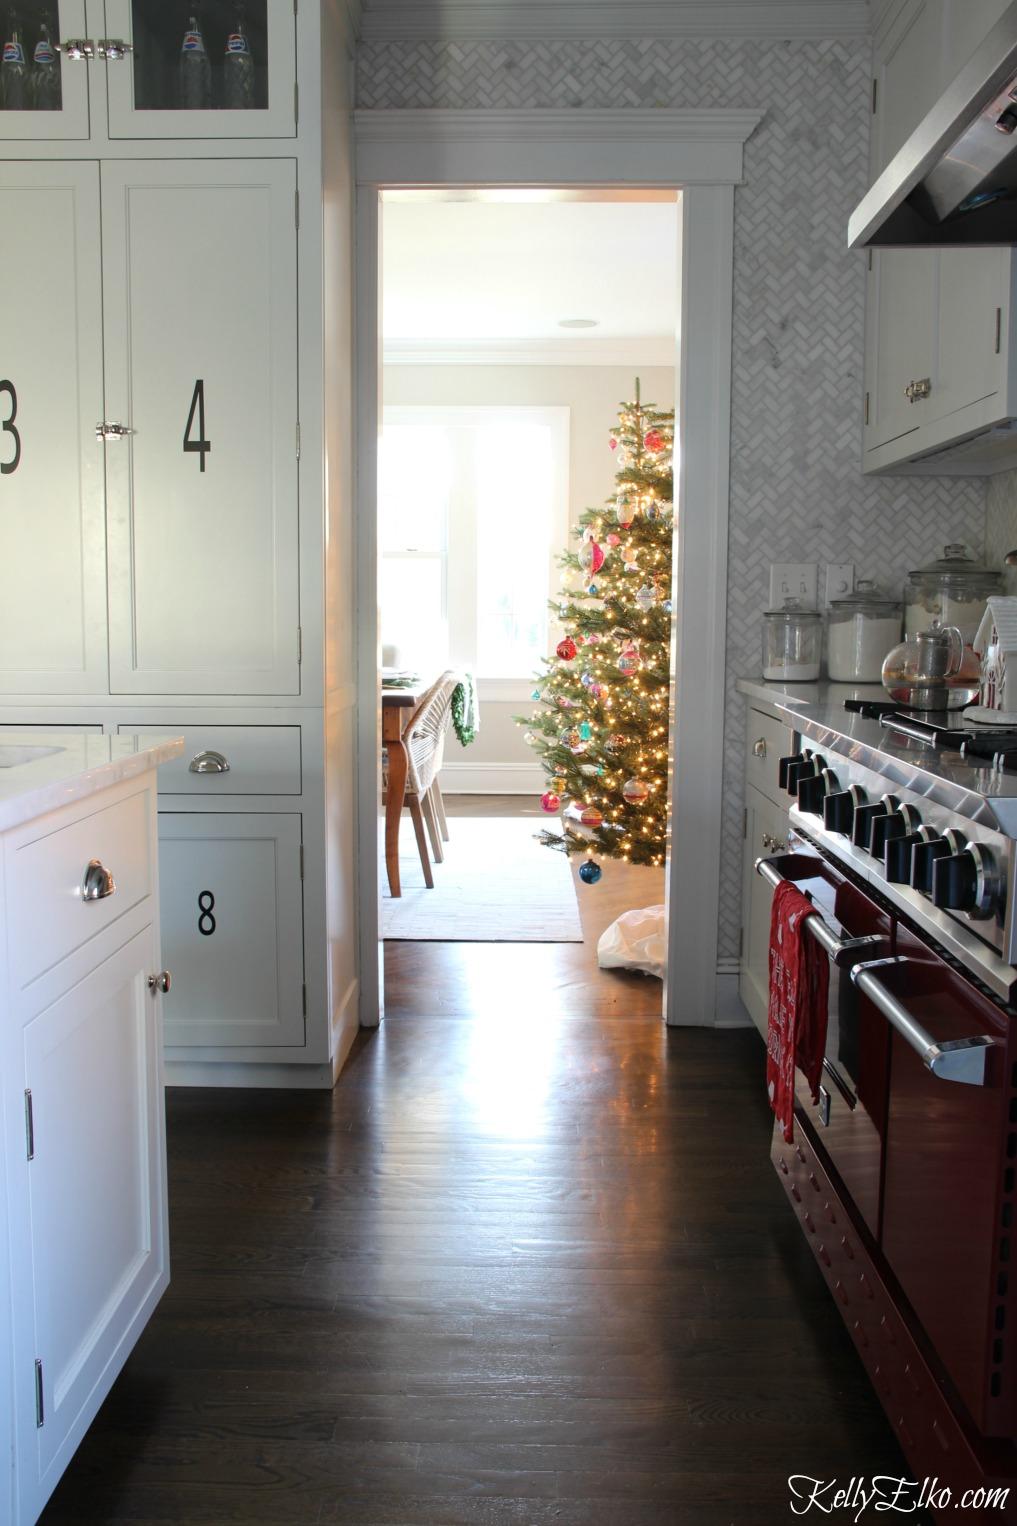 Christmas Kitchen - love the red stove kellyelko.com